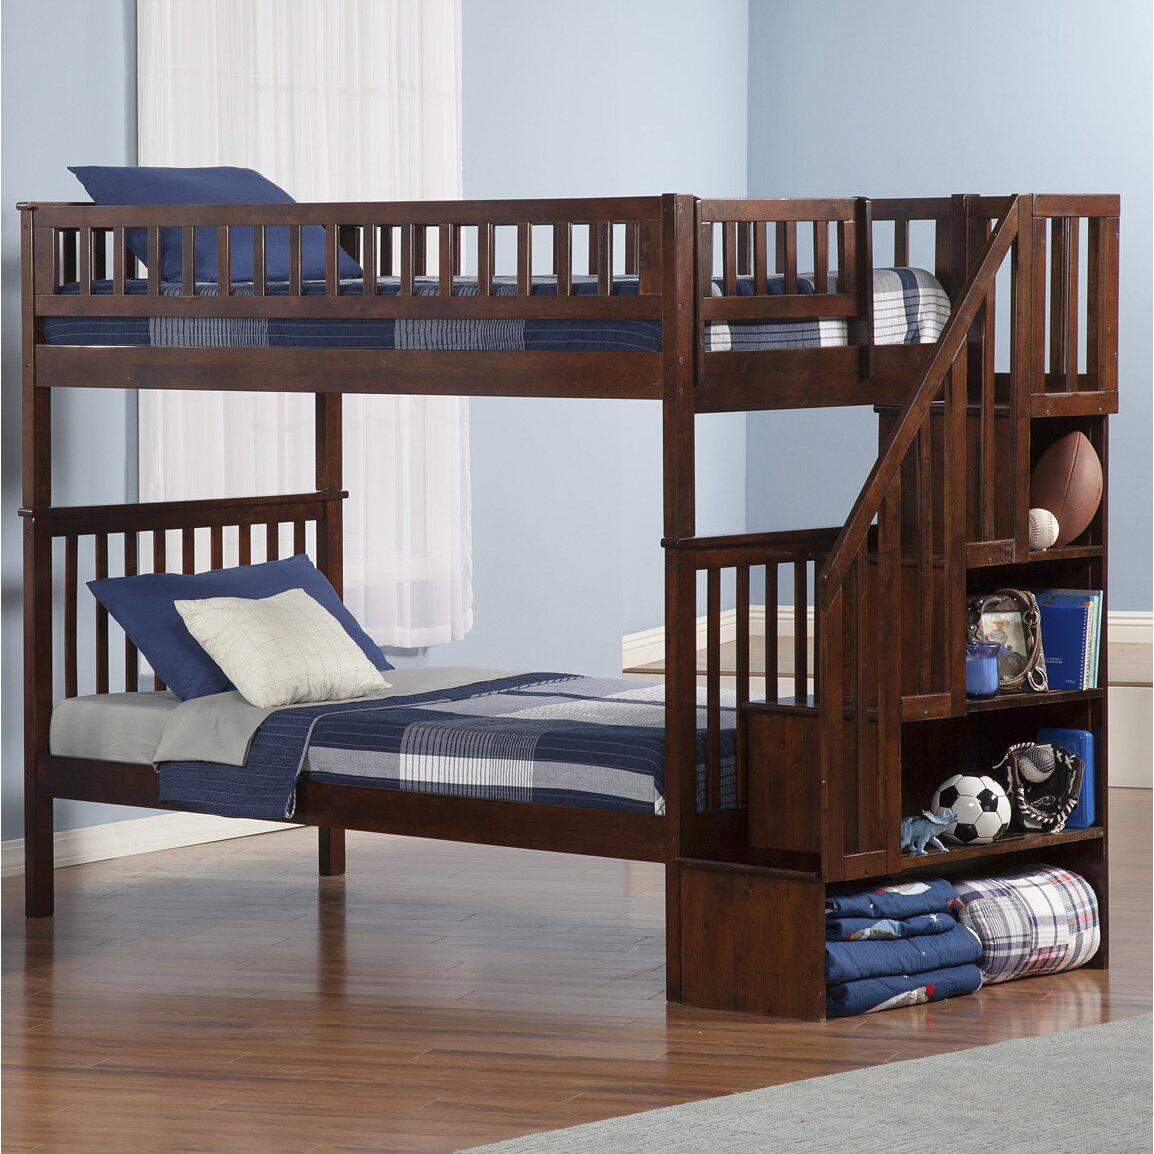 atlantic furniture woodland twin bunk bed reviews wayfair. Black Bedroom Furniture Sets. Home Design Ideas